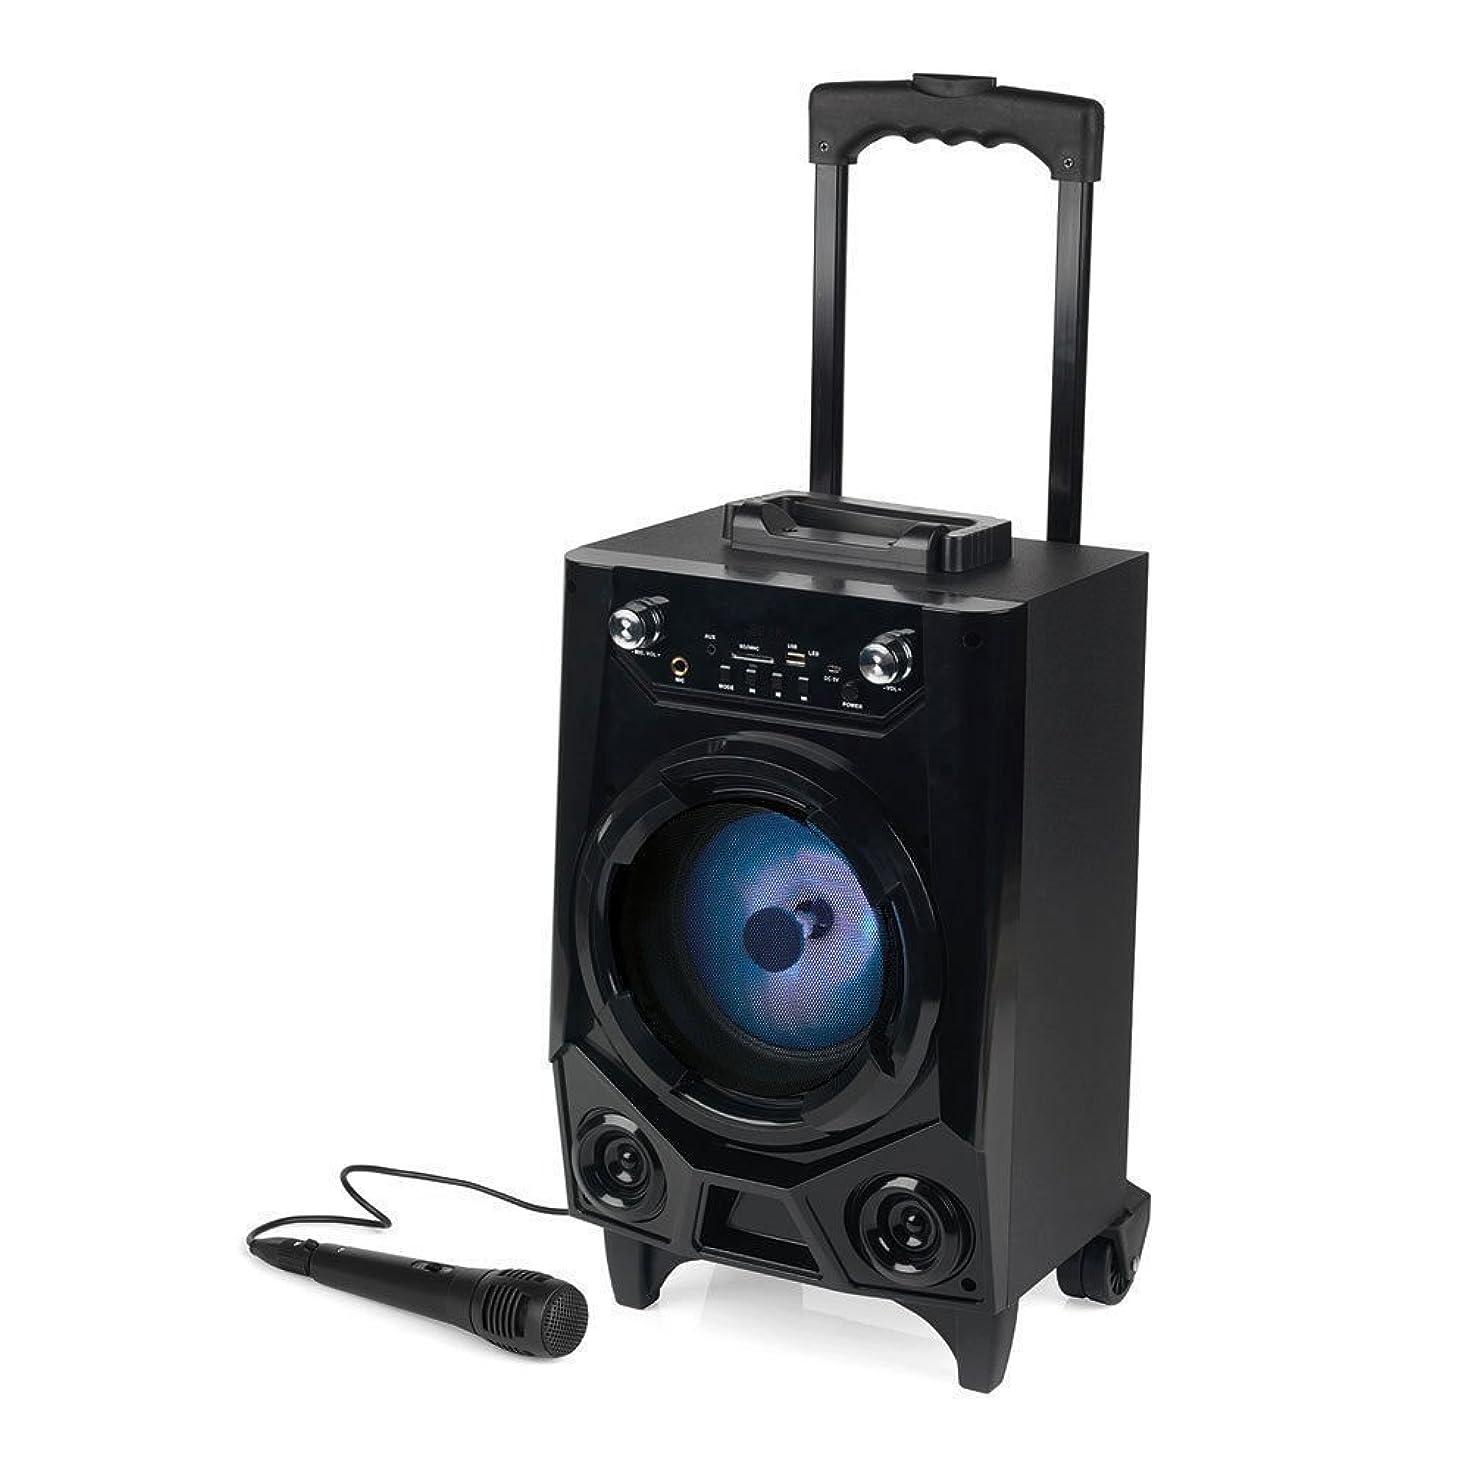 Dazone Portable Bluetooth Tailgate & Trolley Speaker Wireless Sound System w/Built-in Rechargeable Battery, FM Radio/USB/SD Slot/Karaoke Transport Wheels & Singing Microphone Black 2019 Version